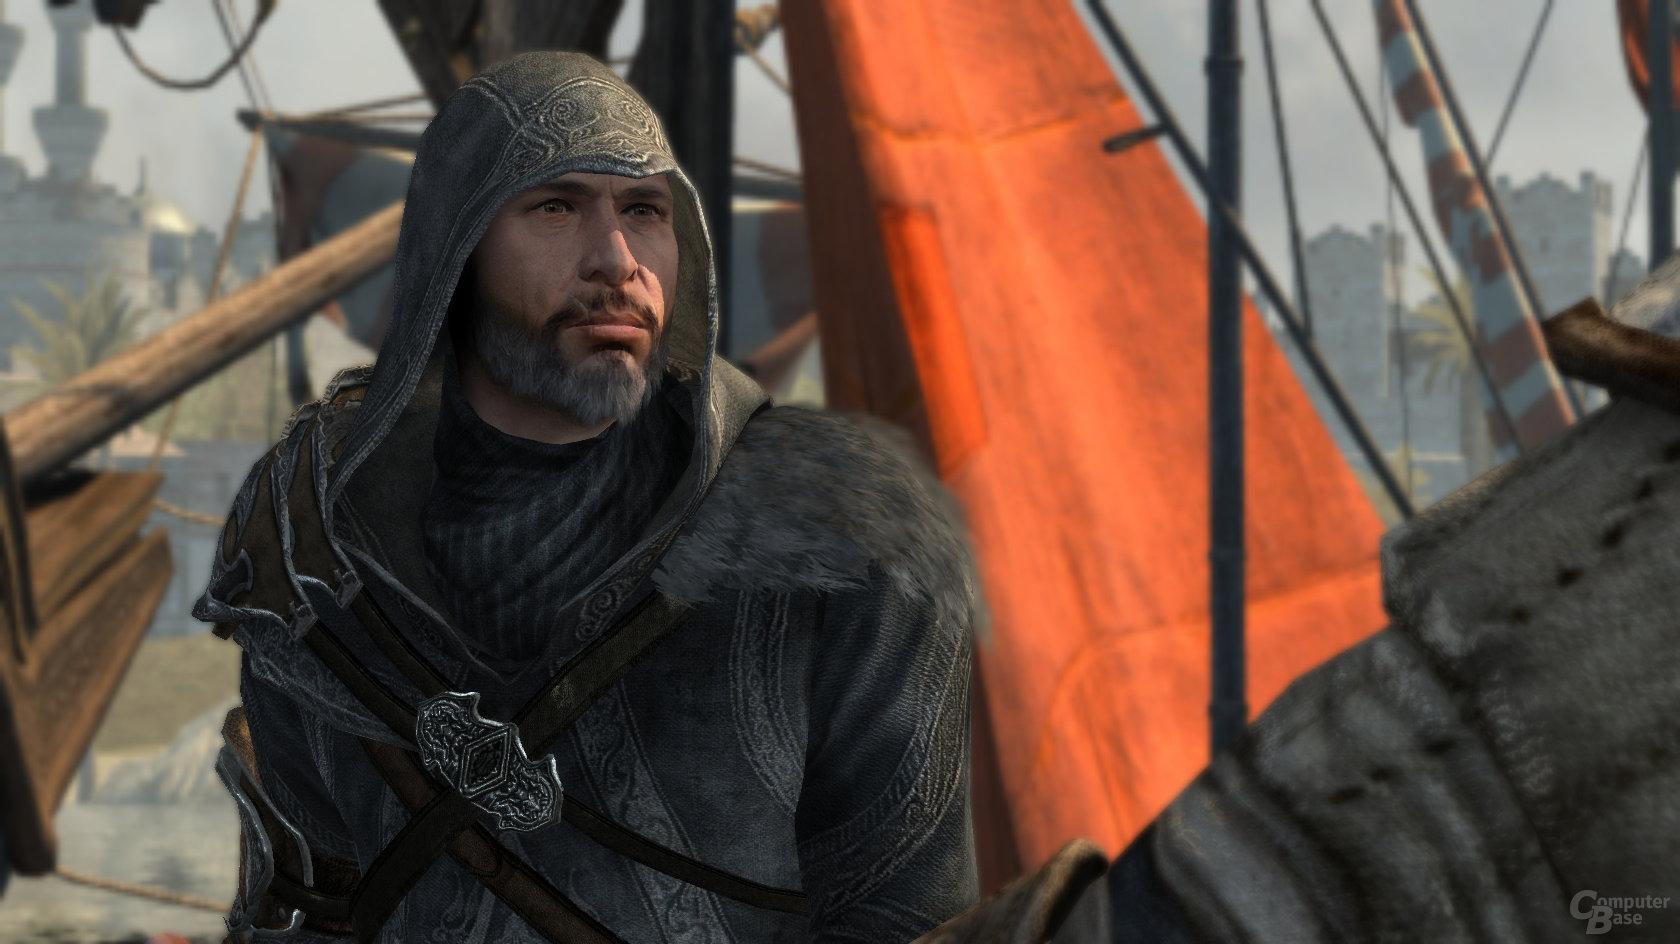 Assassin's Creed: Revelations: ACR-Protagonist Ezio Auditore da Firenze